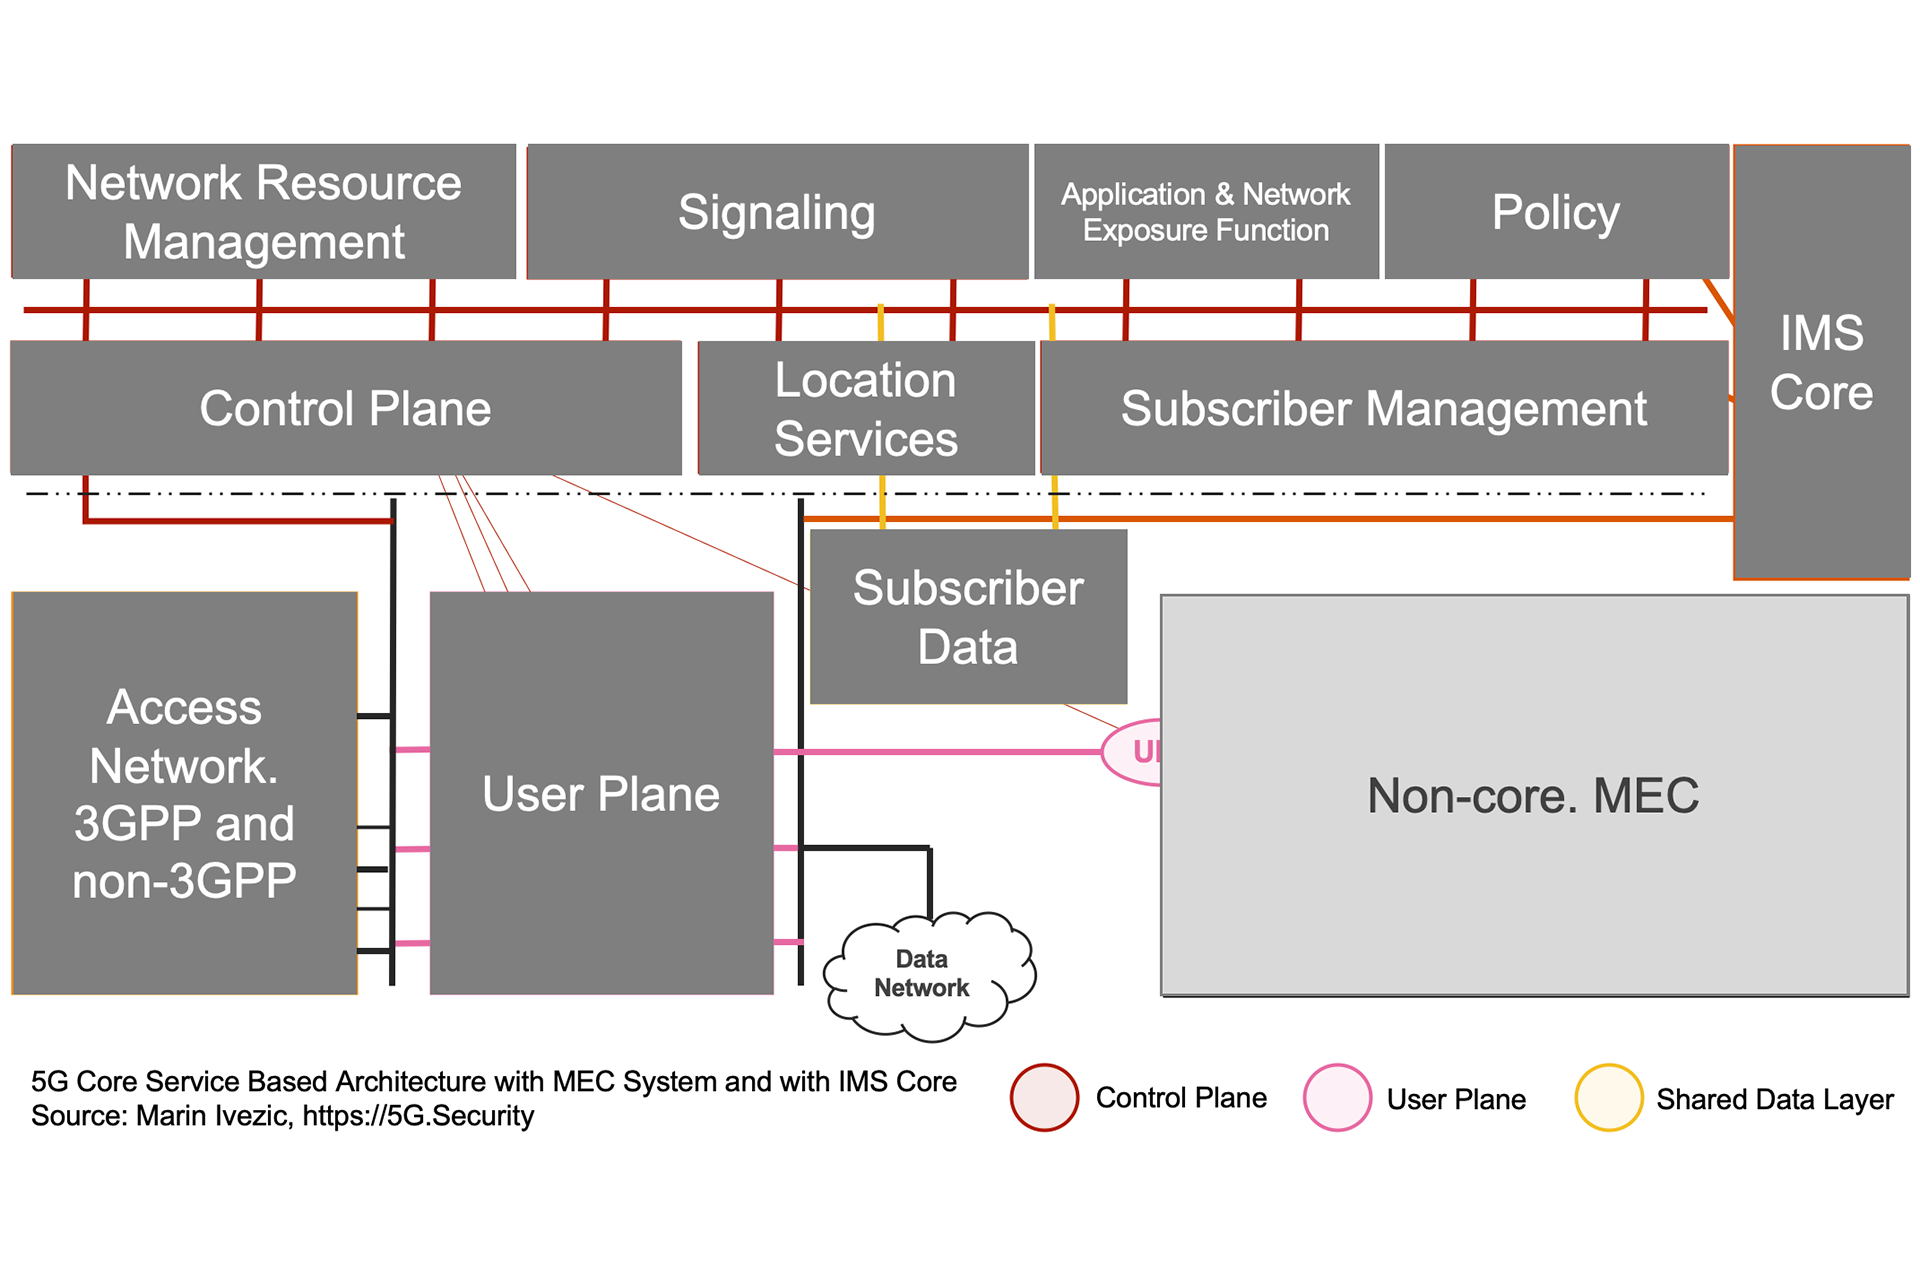 5G SBA IMS MEC Architecture Simplified